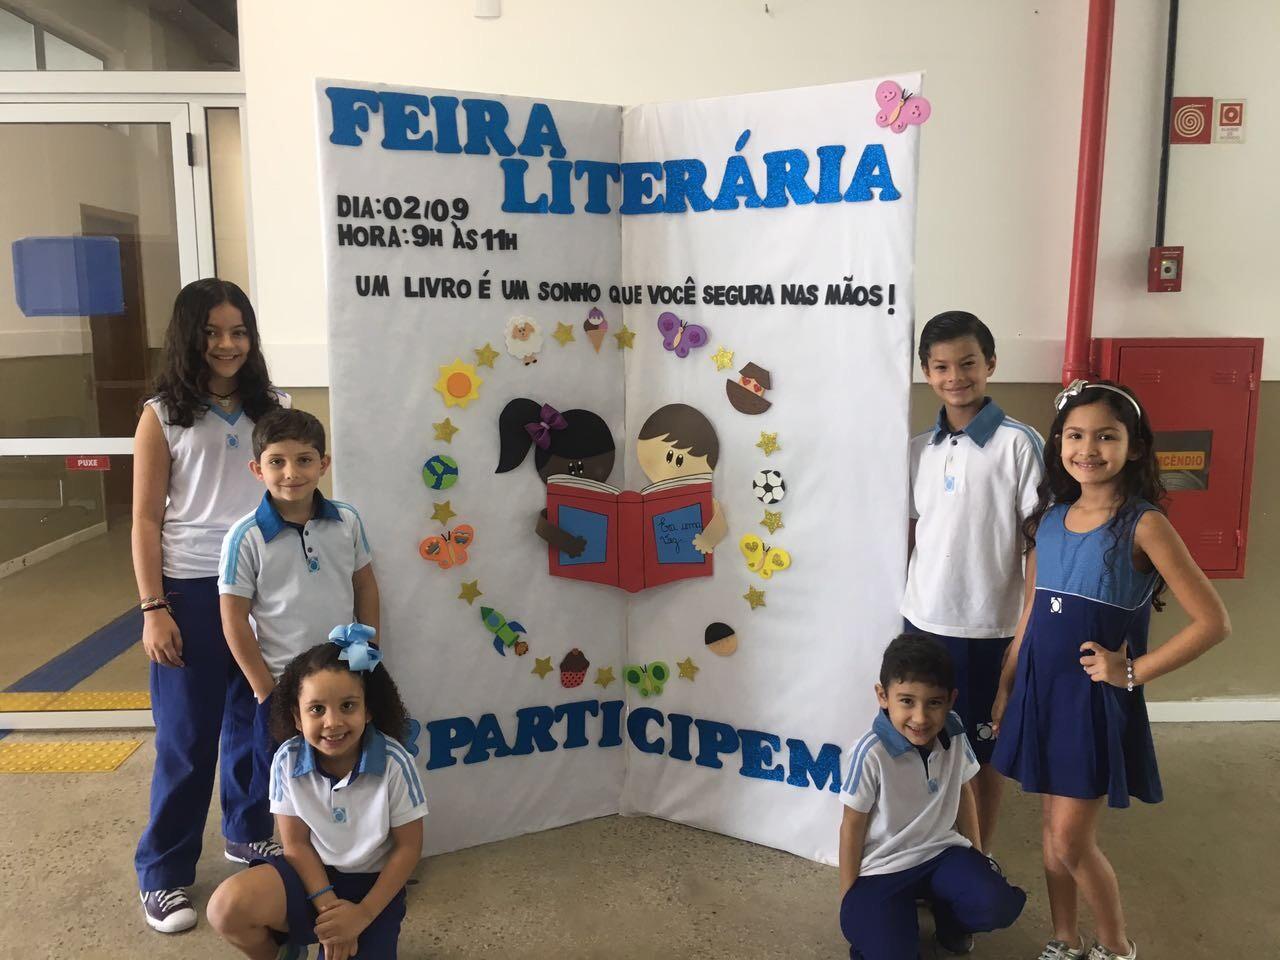 feira literria